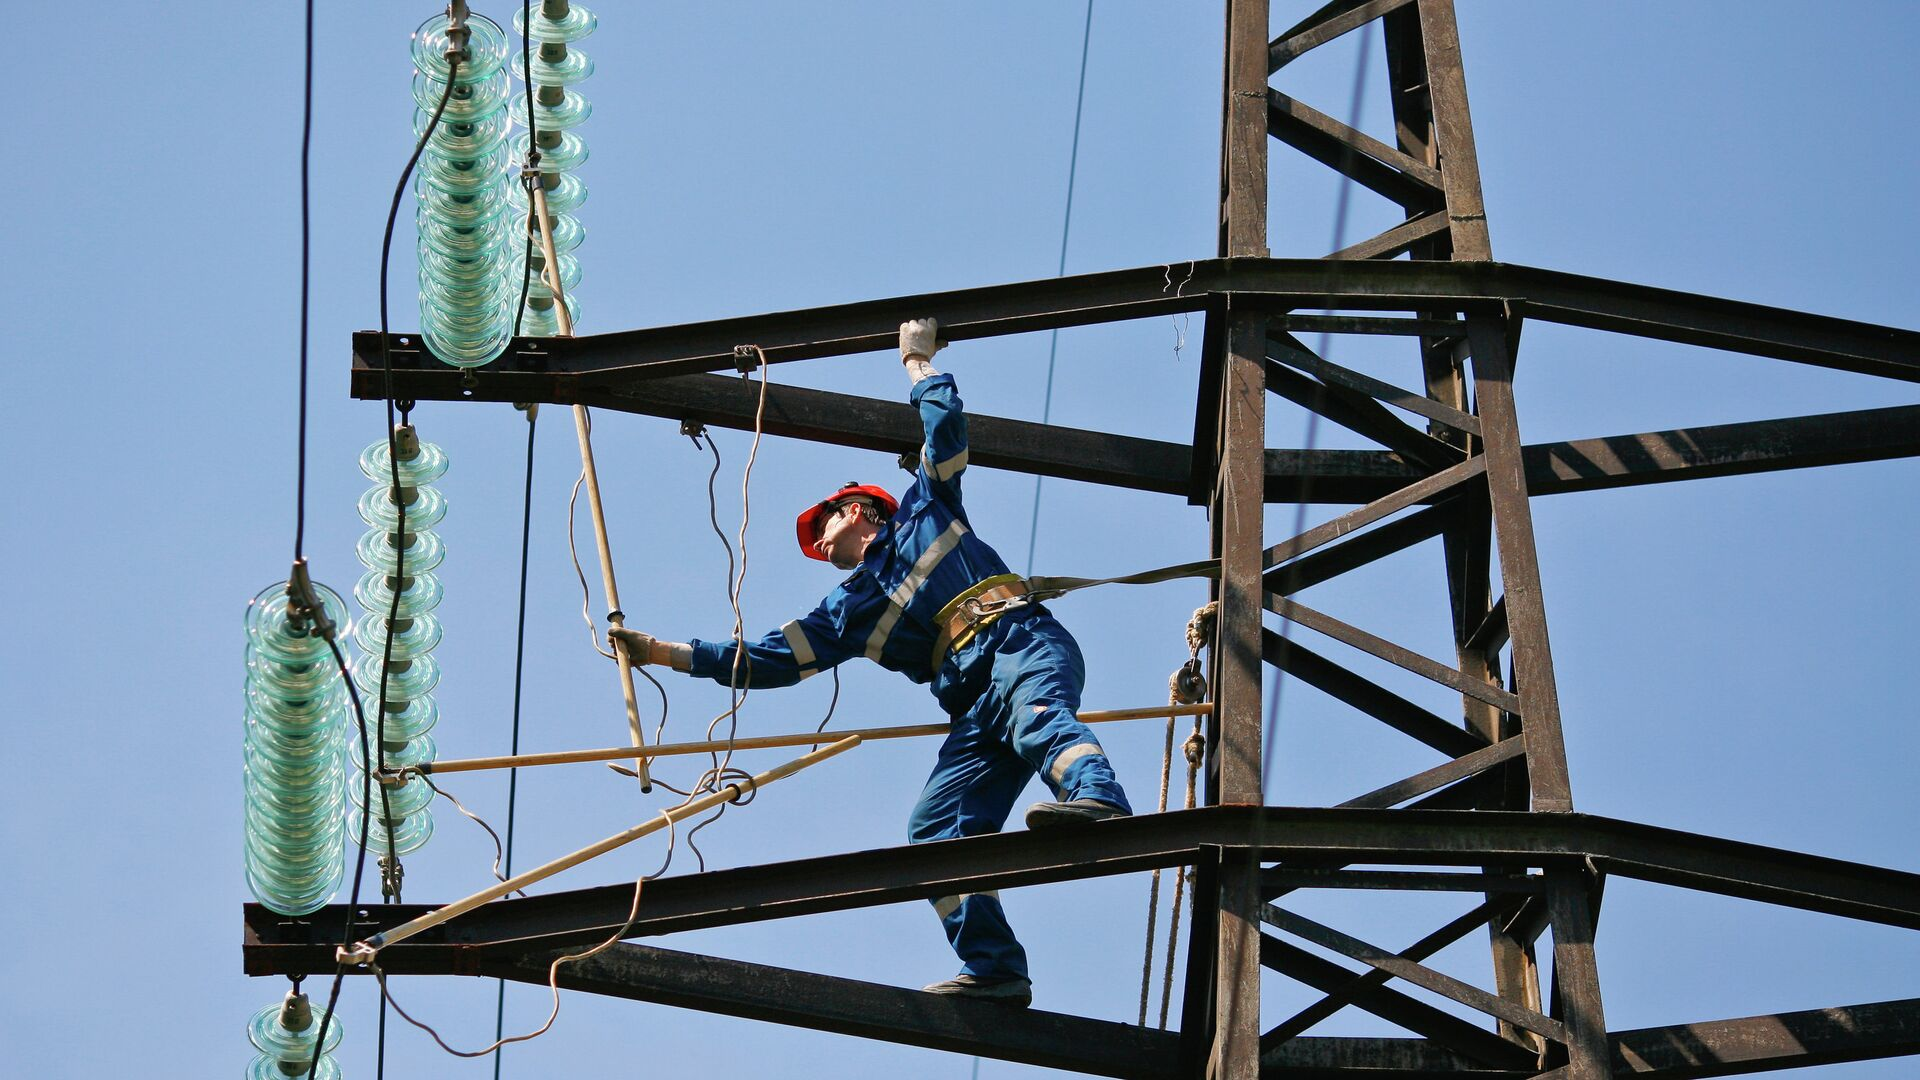 Монтажник проводит ремонт на линии электропередачи - РИА Новости, 1920, 18.09.2020